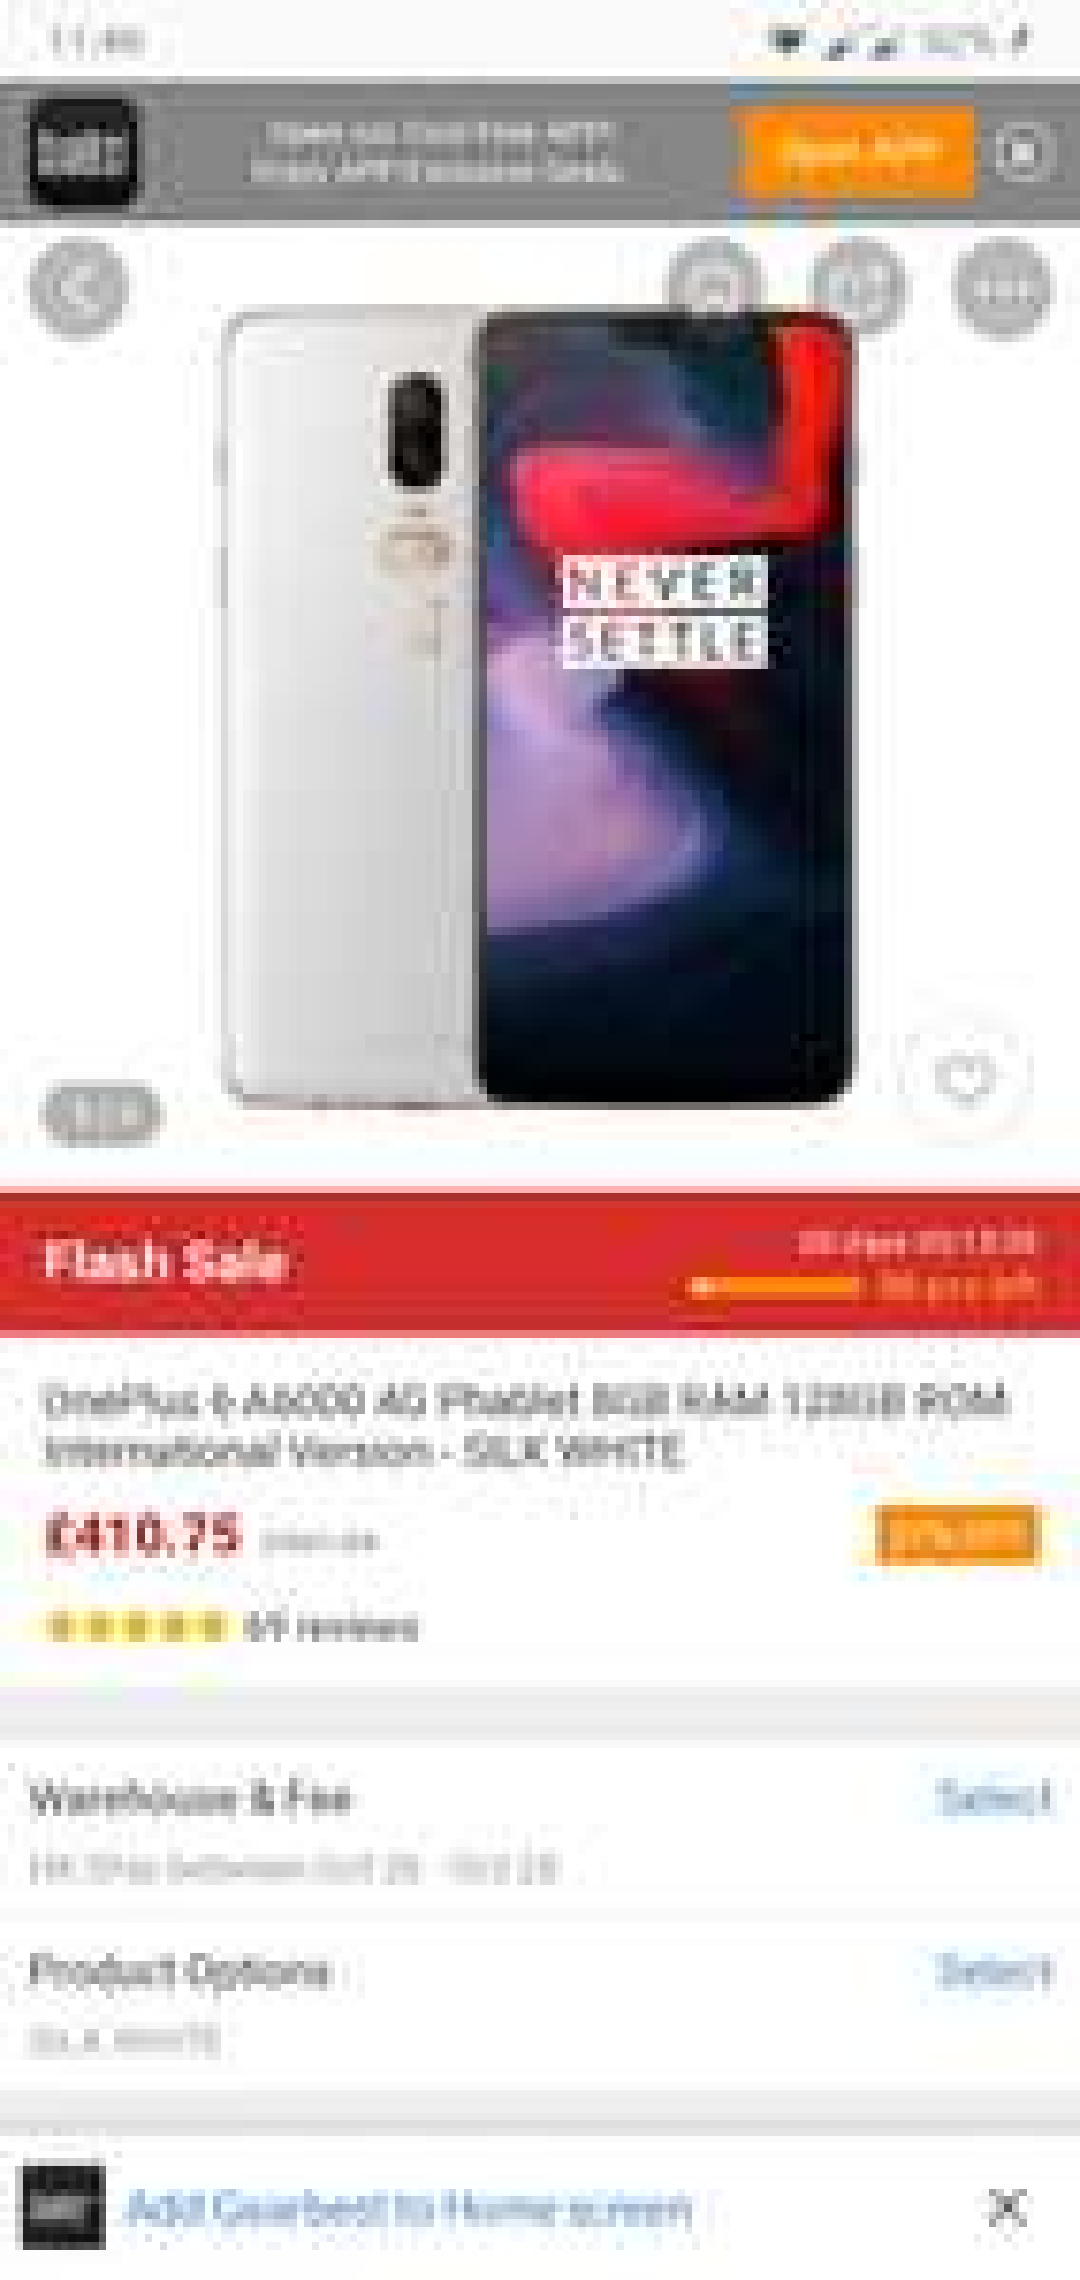 Oneplus 6  8/128gb gearbest uk flash offer £410.75 @ Gearbest